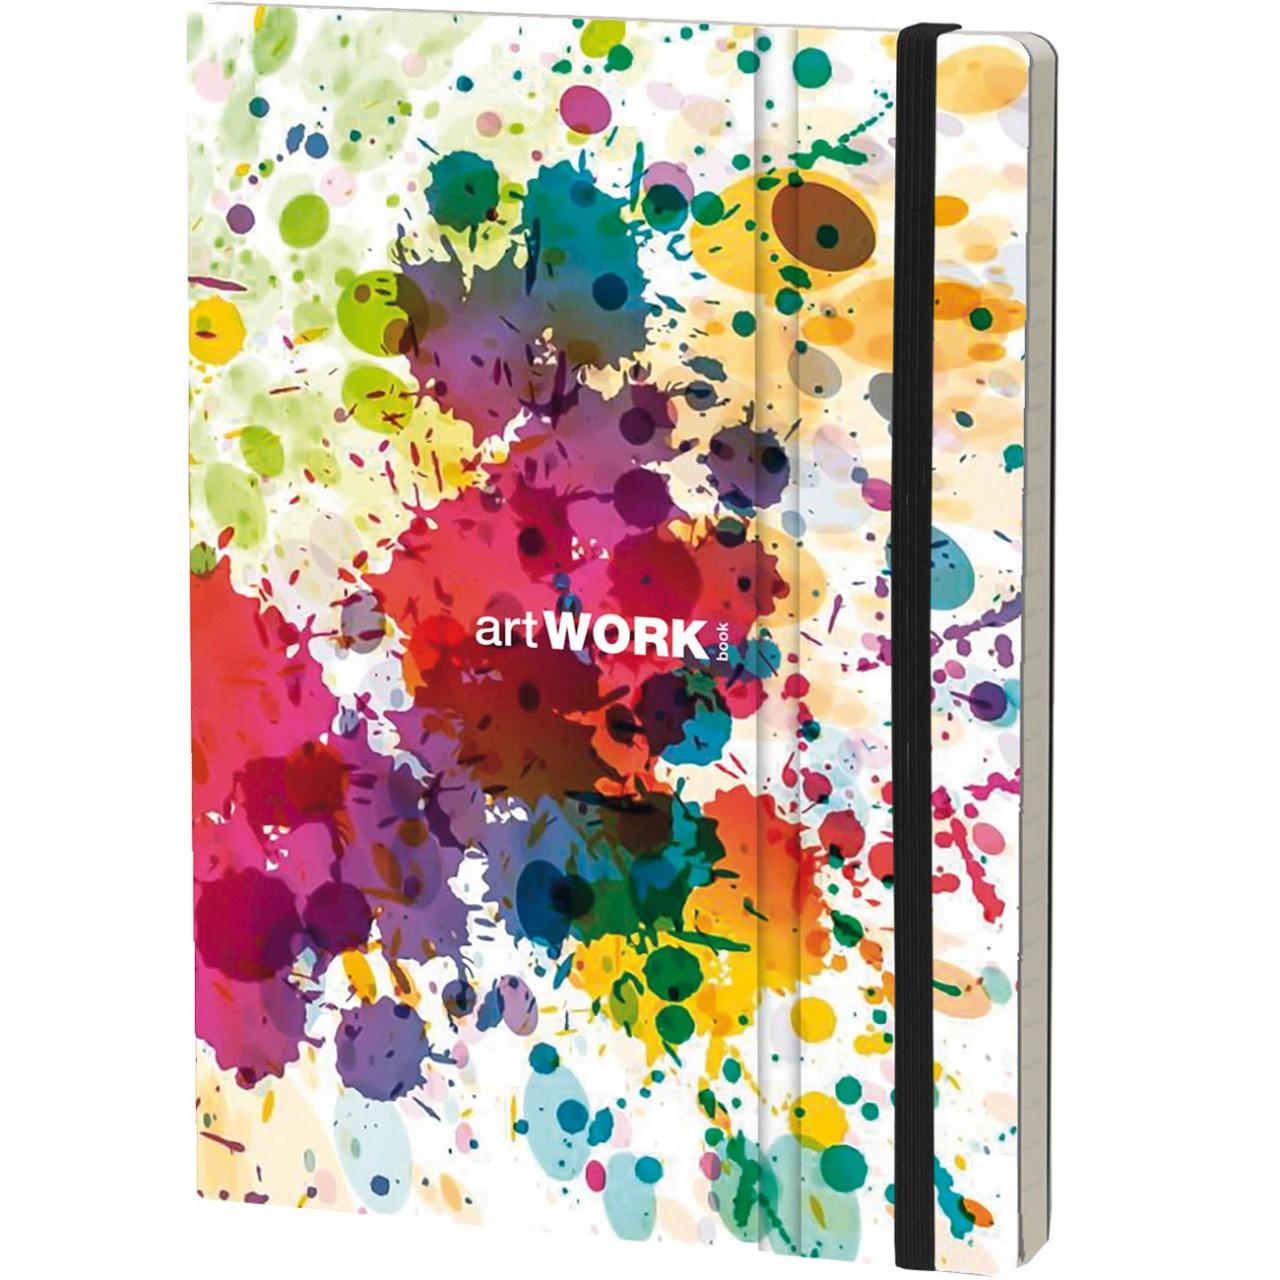 Stifflex Notizbuch ARTWORK BOOK 15 x 21 cm 192 S., COLOR SPLASH